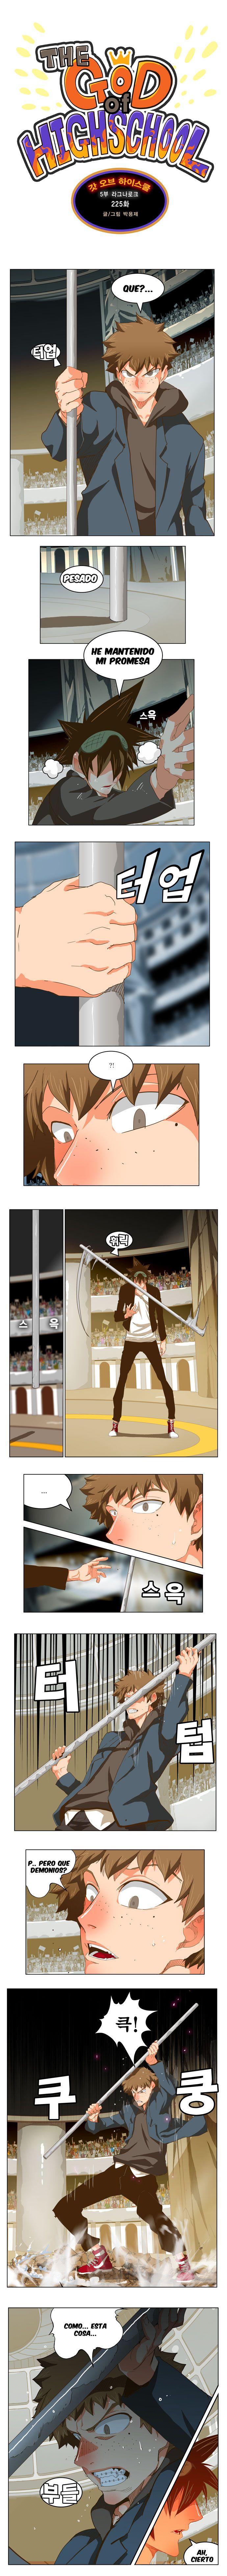 http://c5.ninemanga.com/es_manga/37/485/456848/080e8d277fd35c6b839e062d62aced59.jpg Page 2